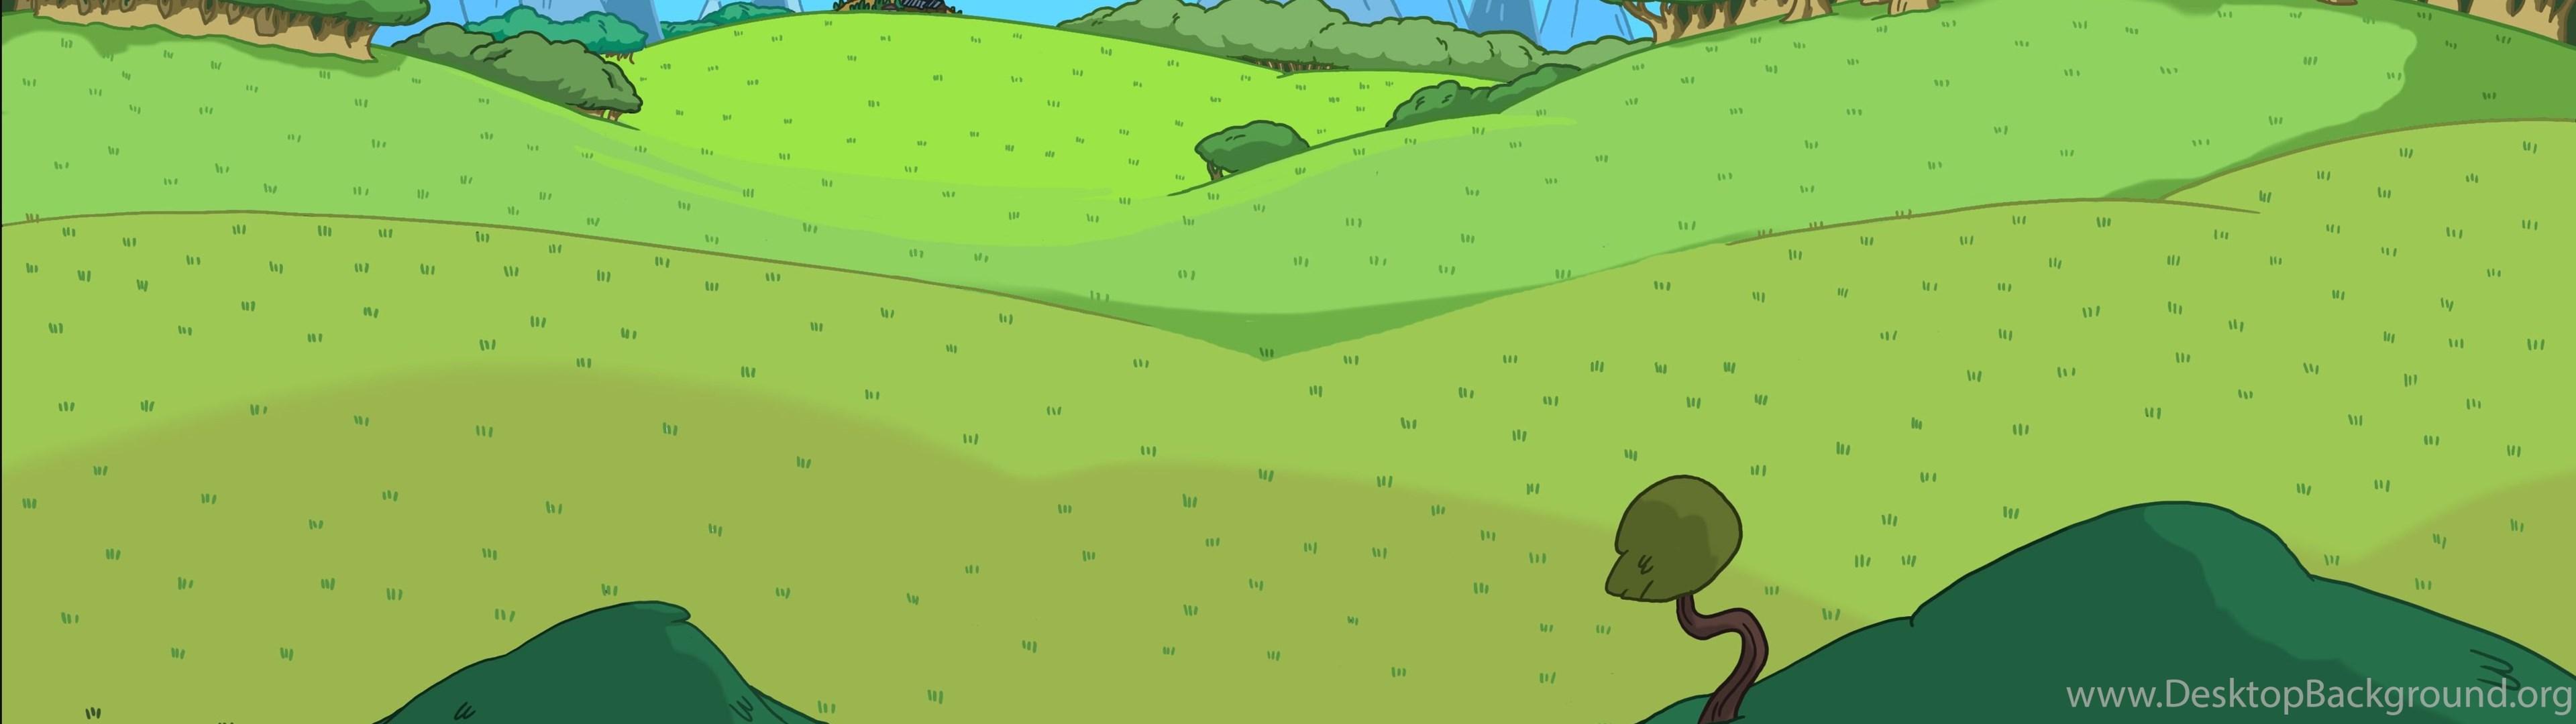 Adventure Time Wallpapers Desktop Background